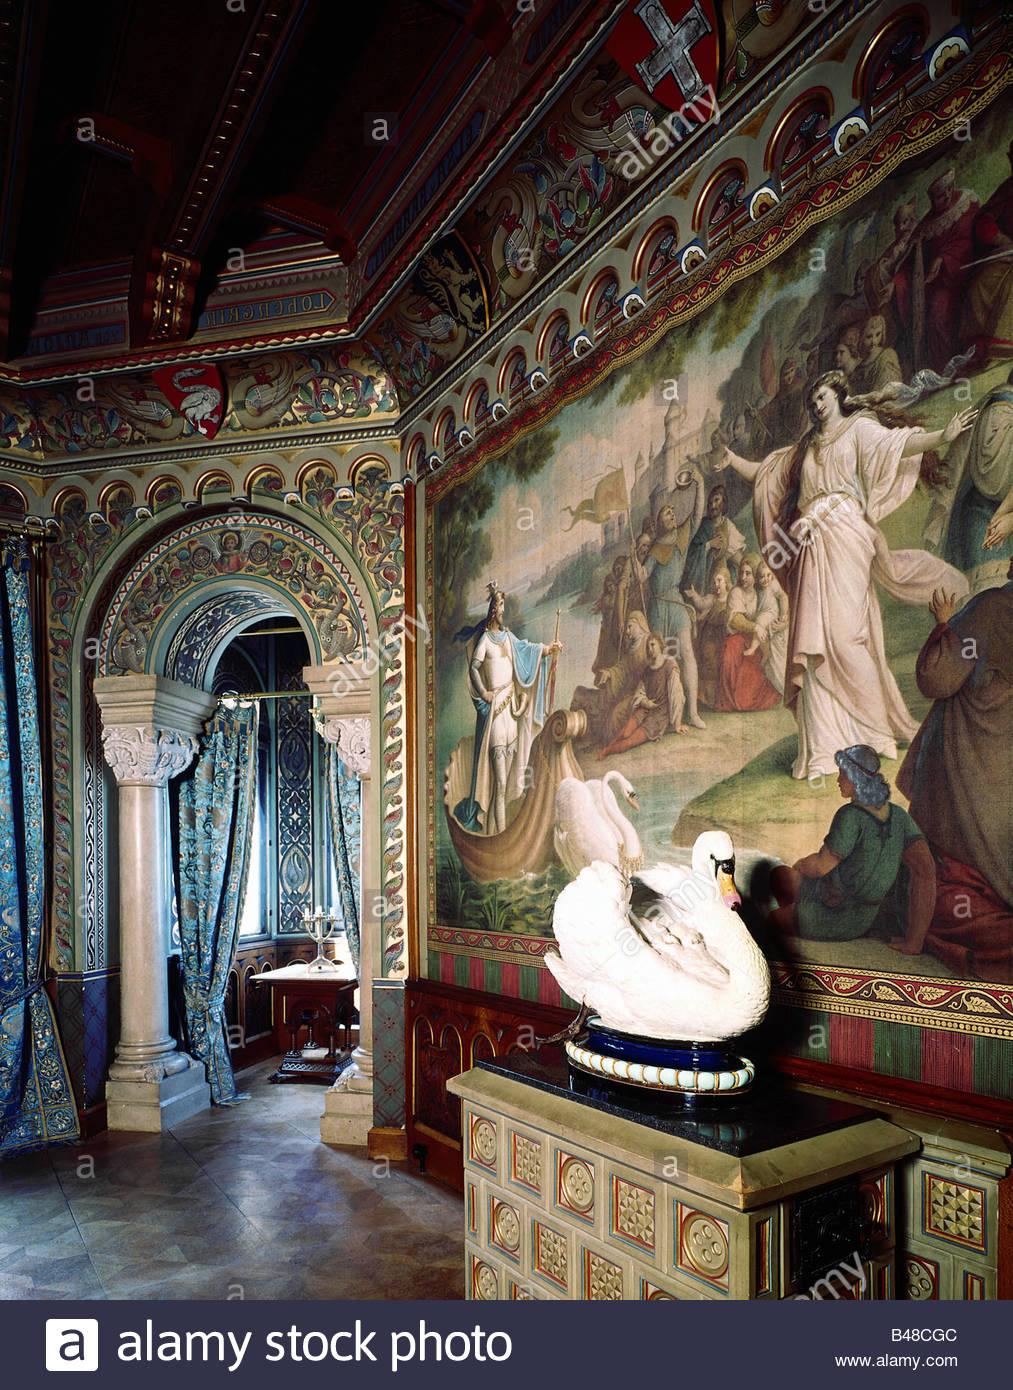 "Receiving Room ""Hall of Swans"" Architecture-castles-germany-bavaria-neuschwanstein-castle-interior-B48CGC"